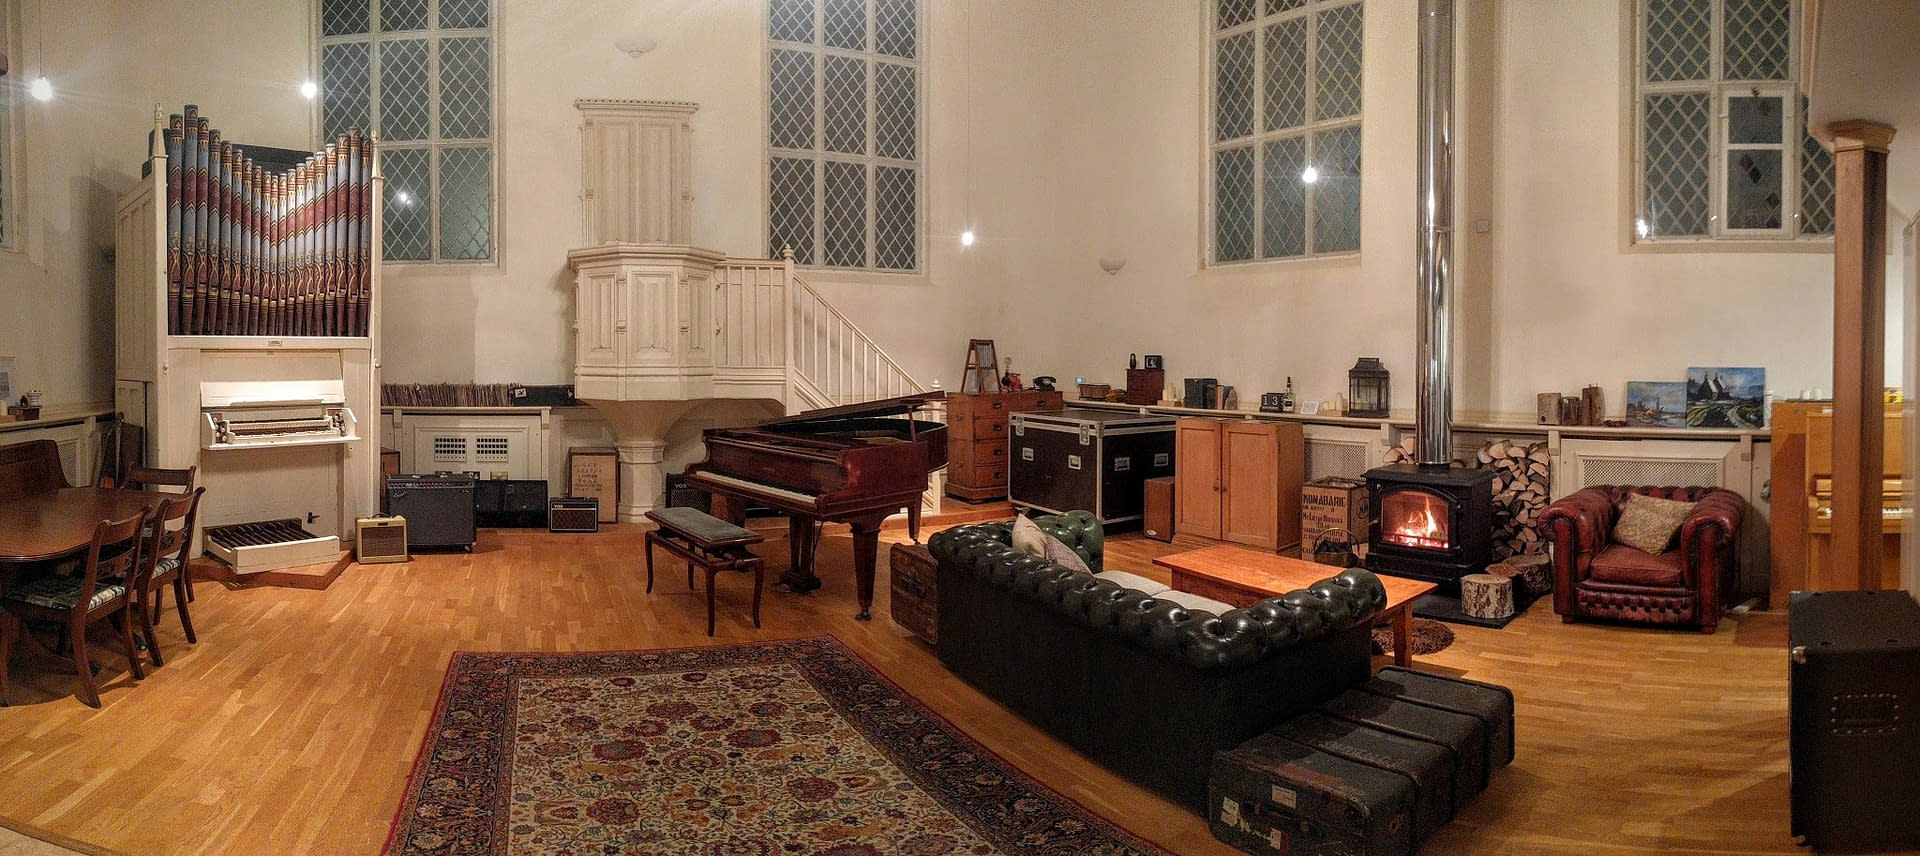 Grand Chapel Studios - Main Room at Night